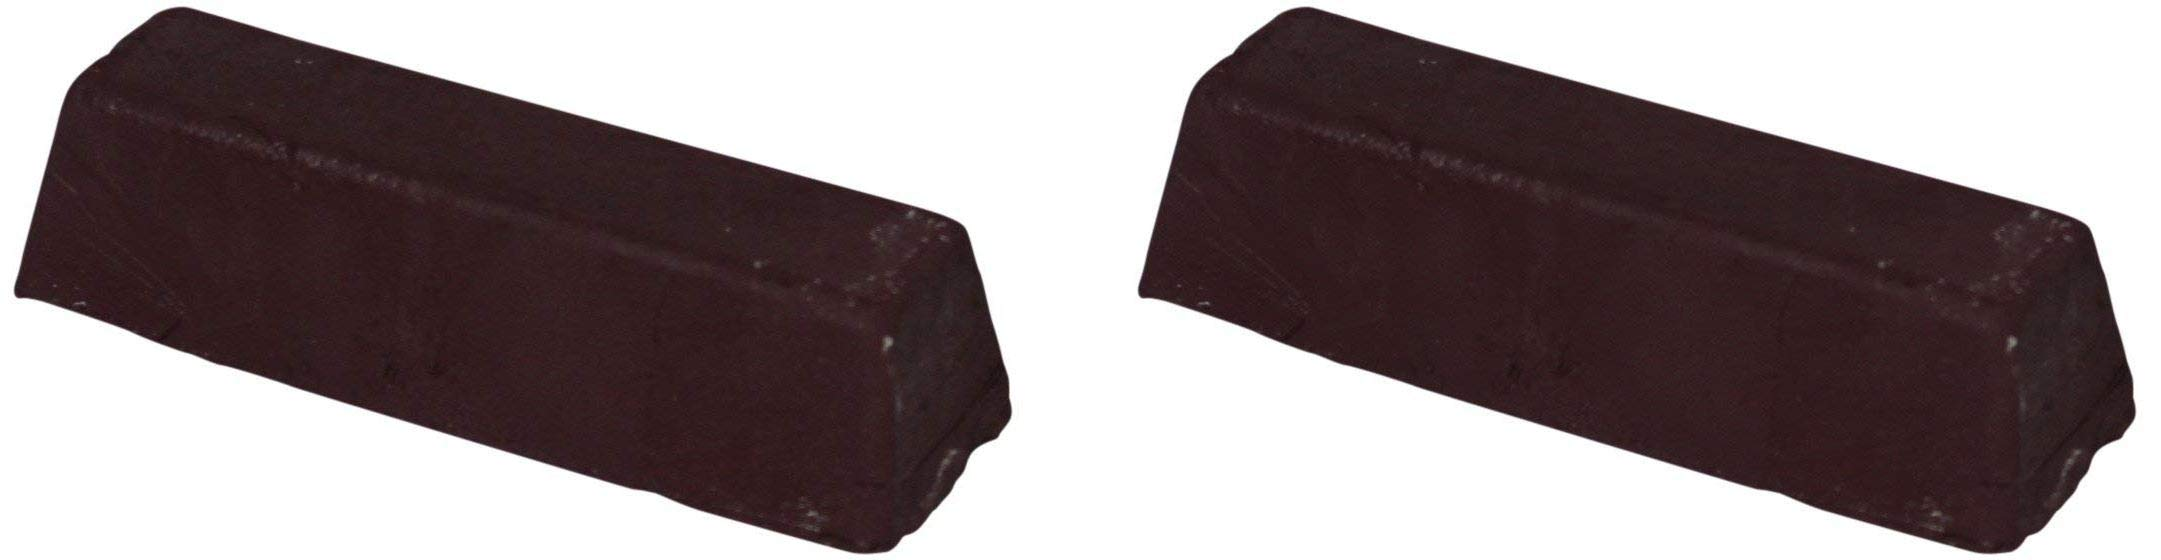 JacksonLea 47351SP Brown Buffing Compound, Grande Bar, 2'' Width x 2'' Height x 9'' Length (Twо Pаck)